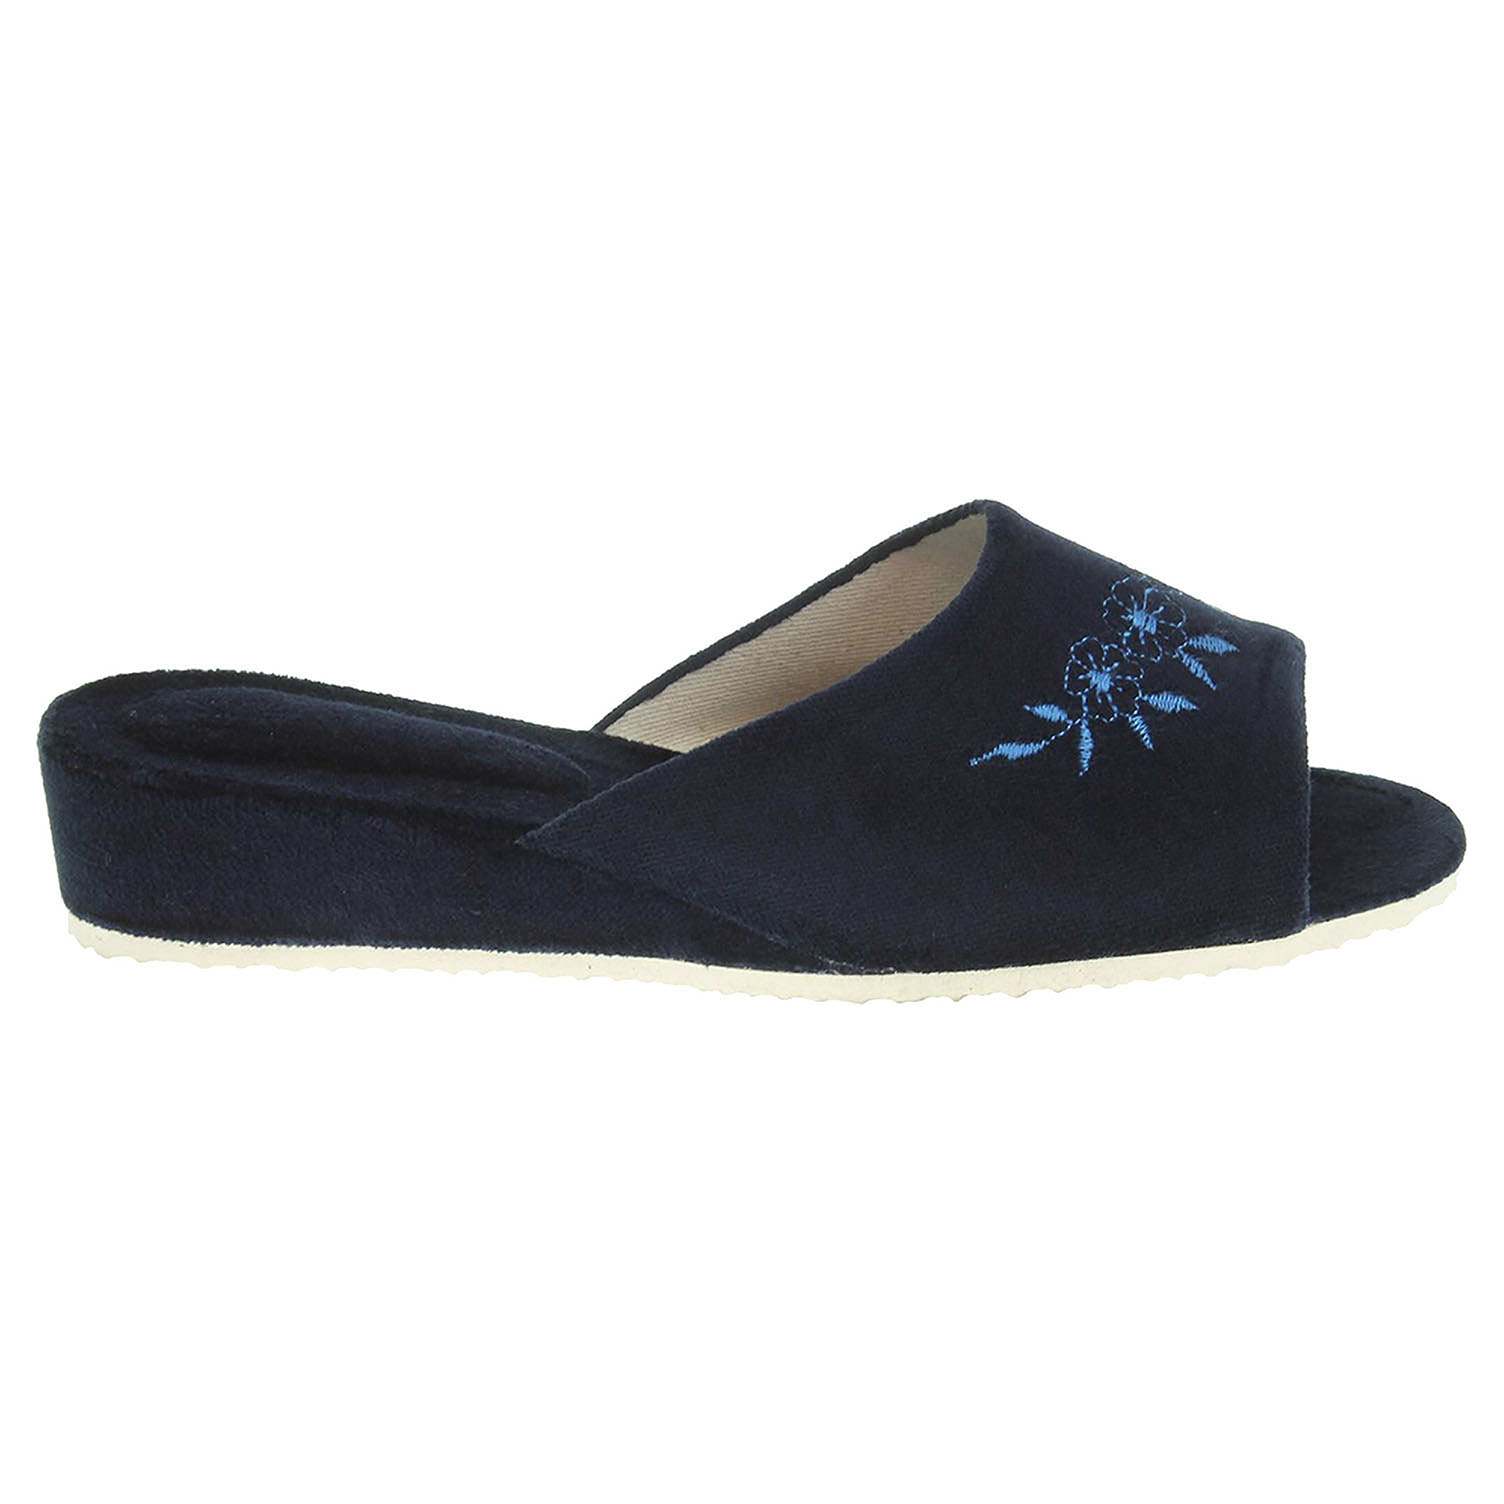 Ecco Dámské domácí pantofle 1030.00 modré 23500475